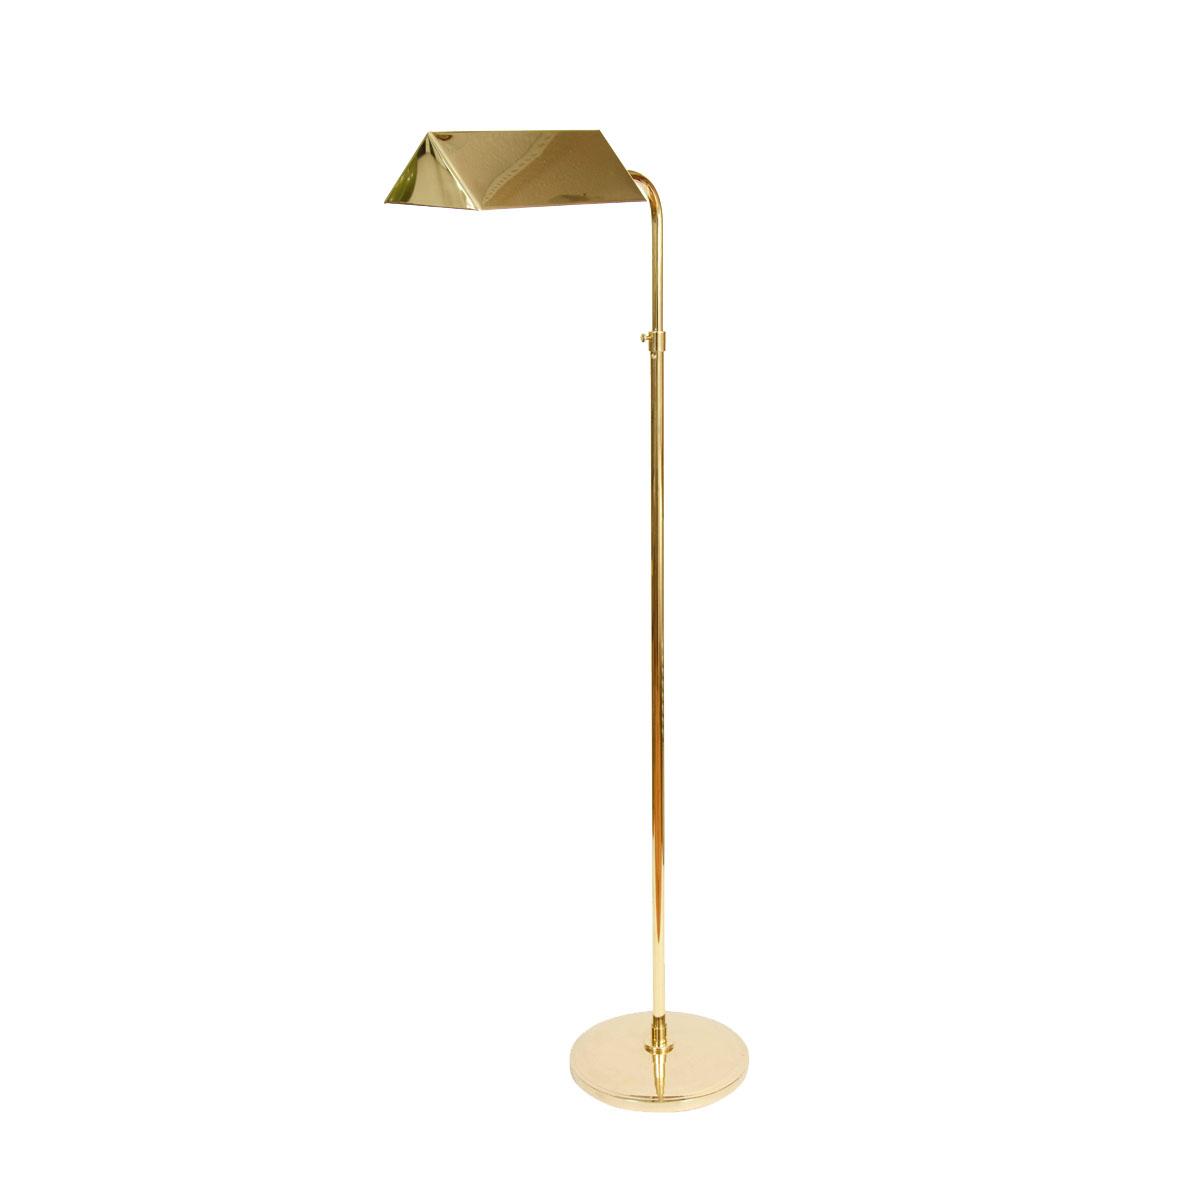 Single brass adjustable floor lamp floor lamps john salibello mozeypictures Choice Image